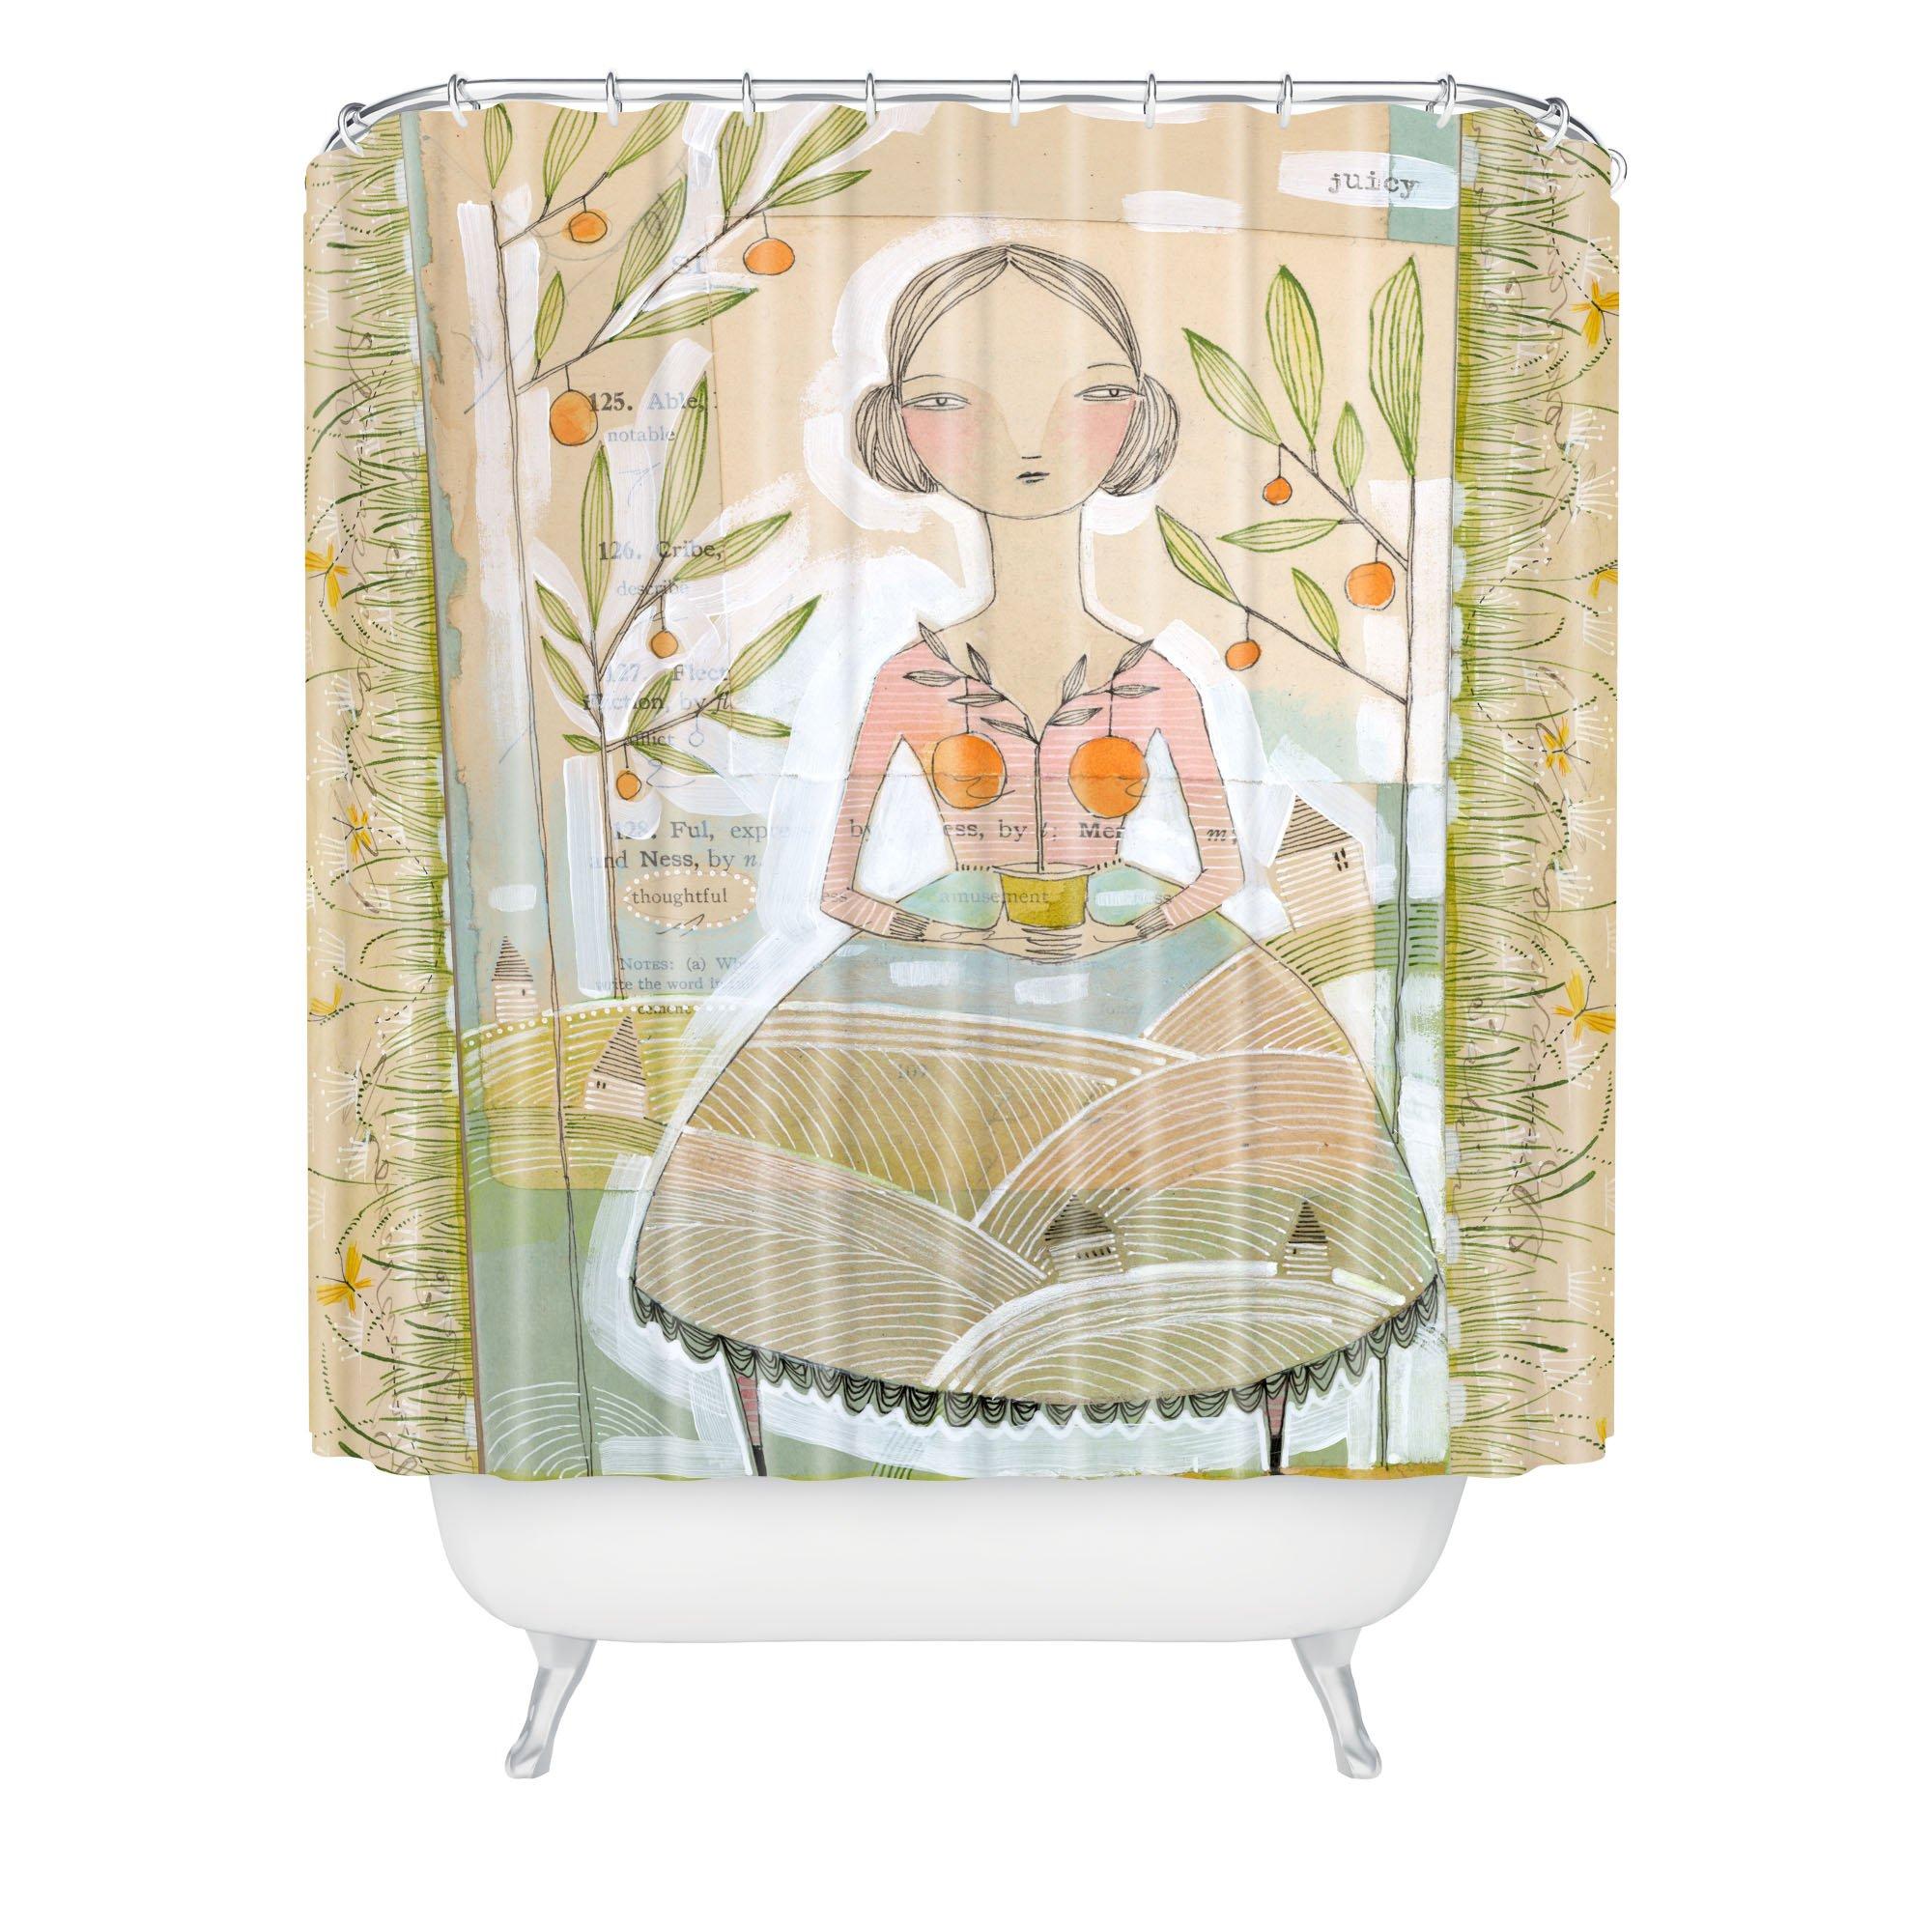 "Deny Designs Cori Dantini Always Thoughtful Shower Curtain, 69"" x 72"""